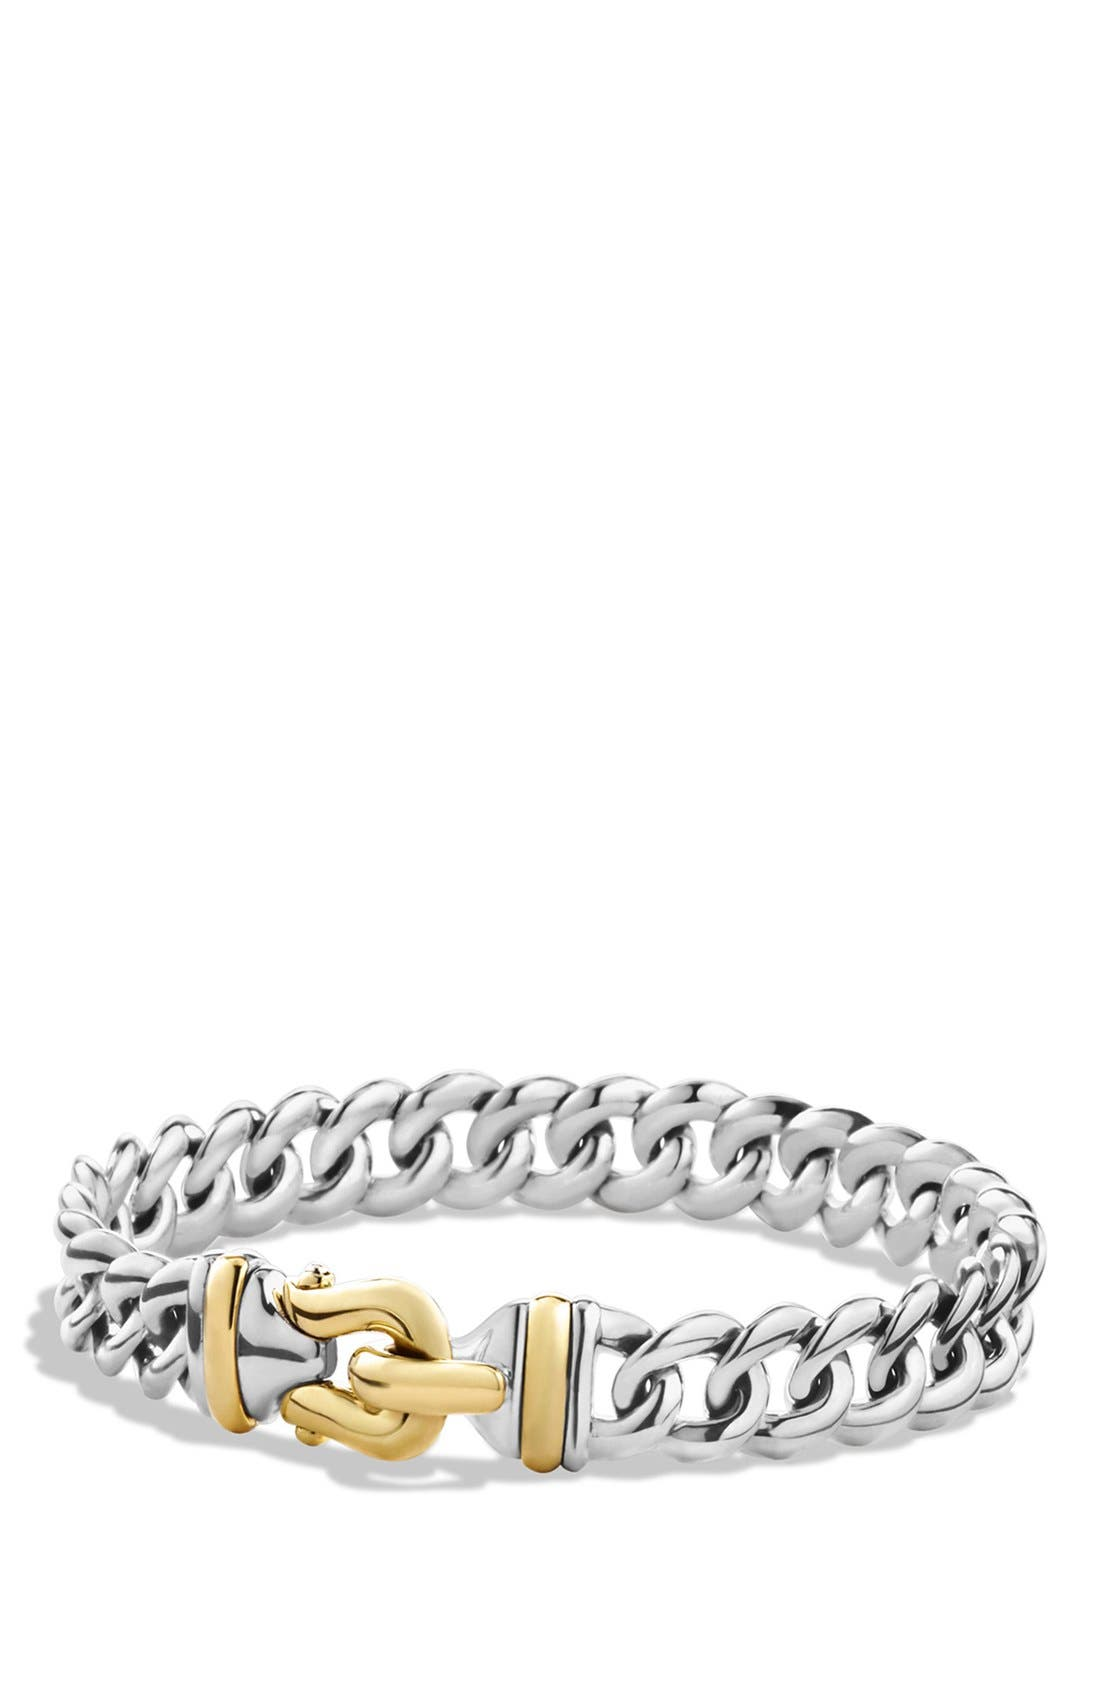 DAVID YURMAN Buckle Single-Row Bracelet with Gold